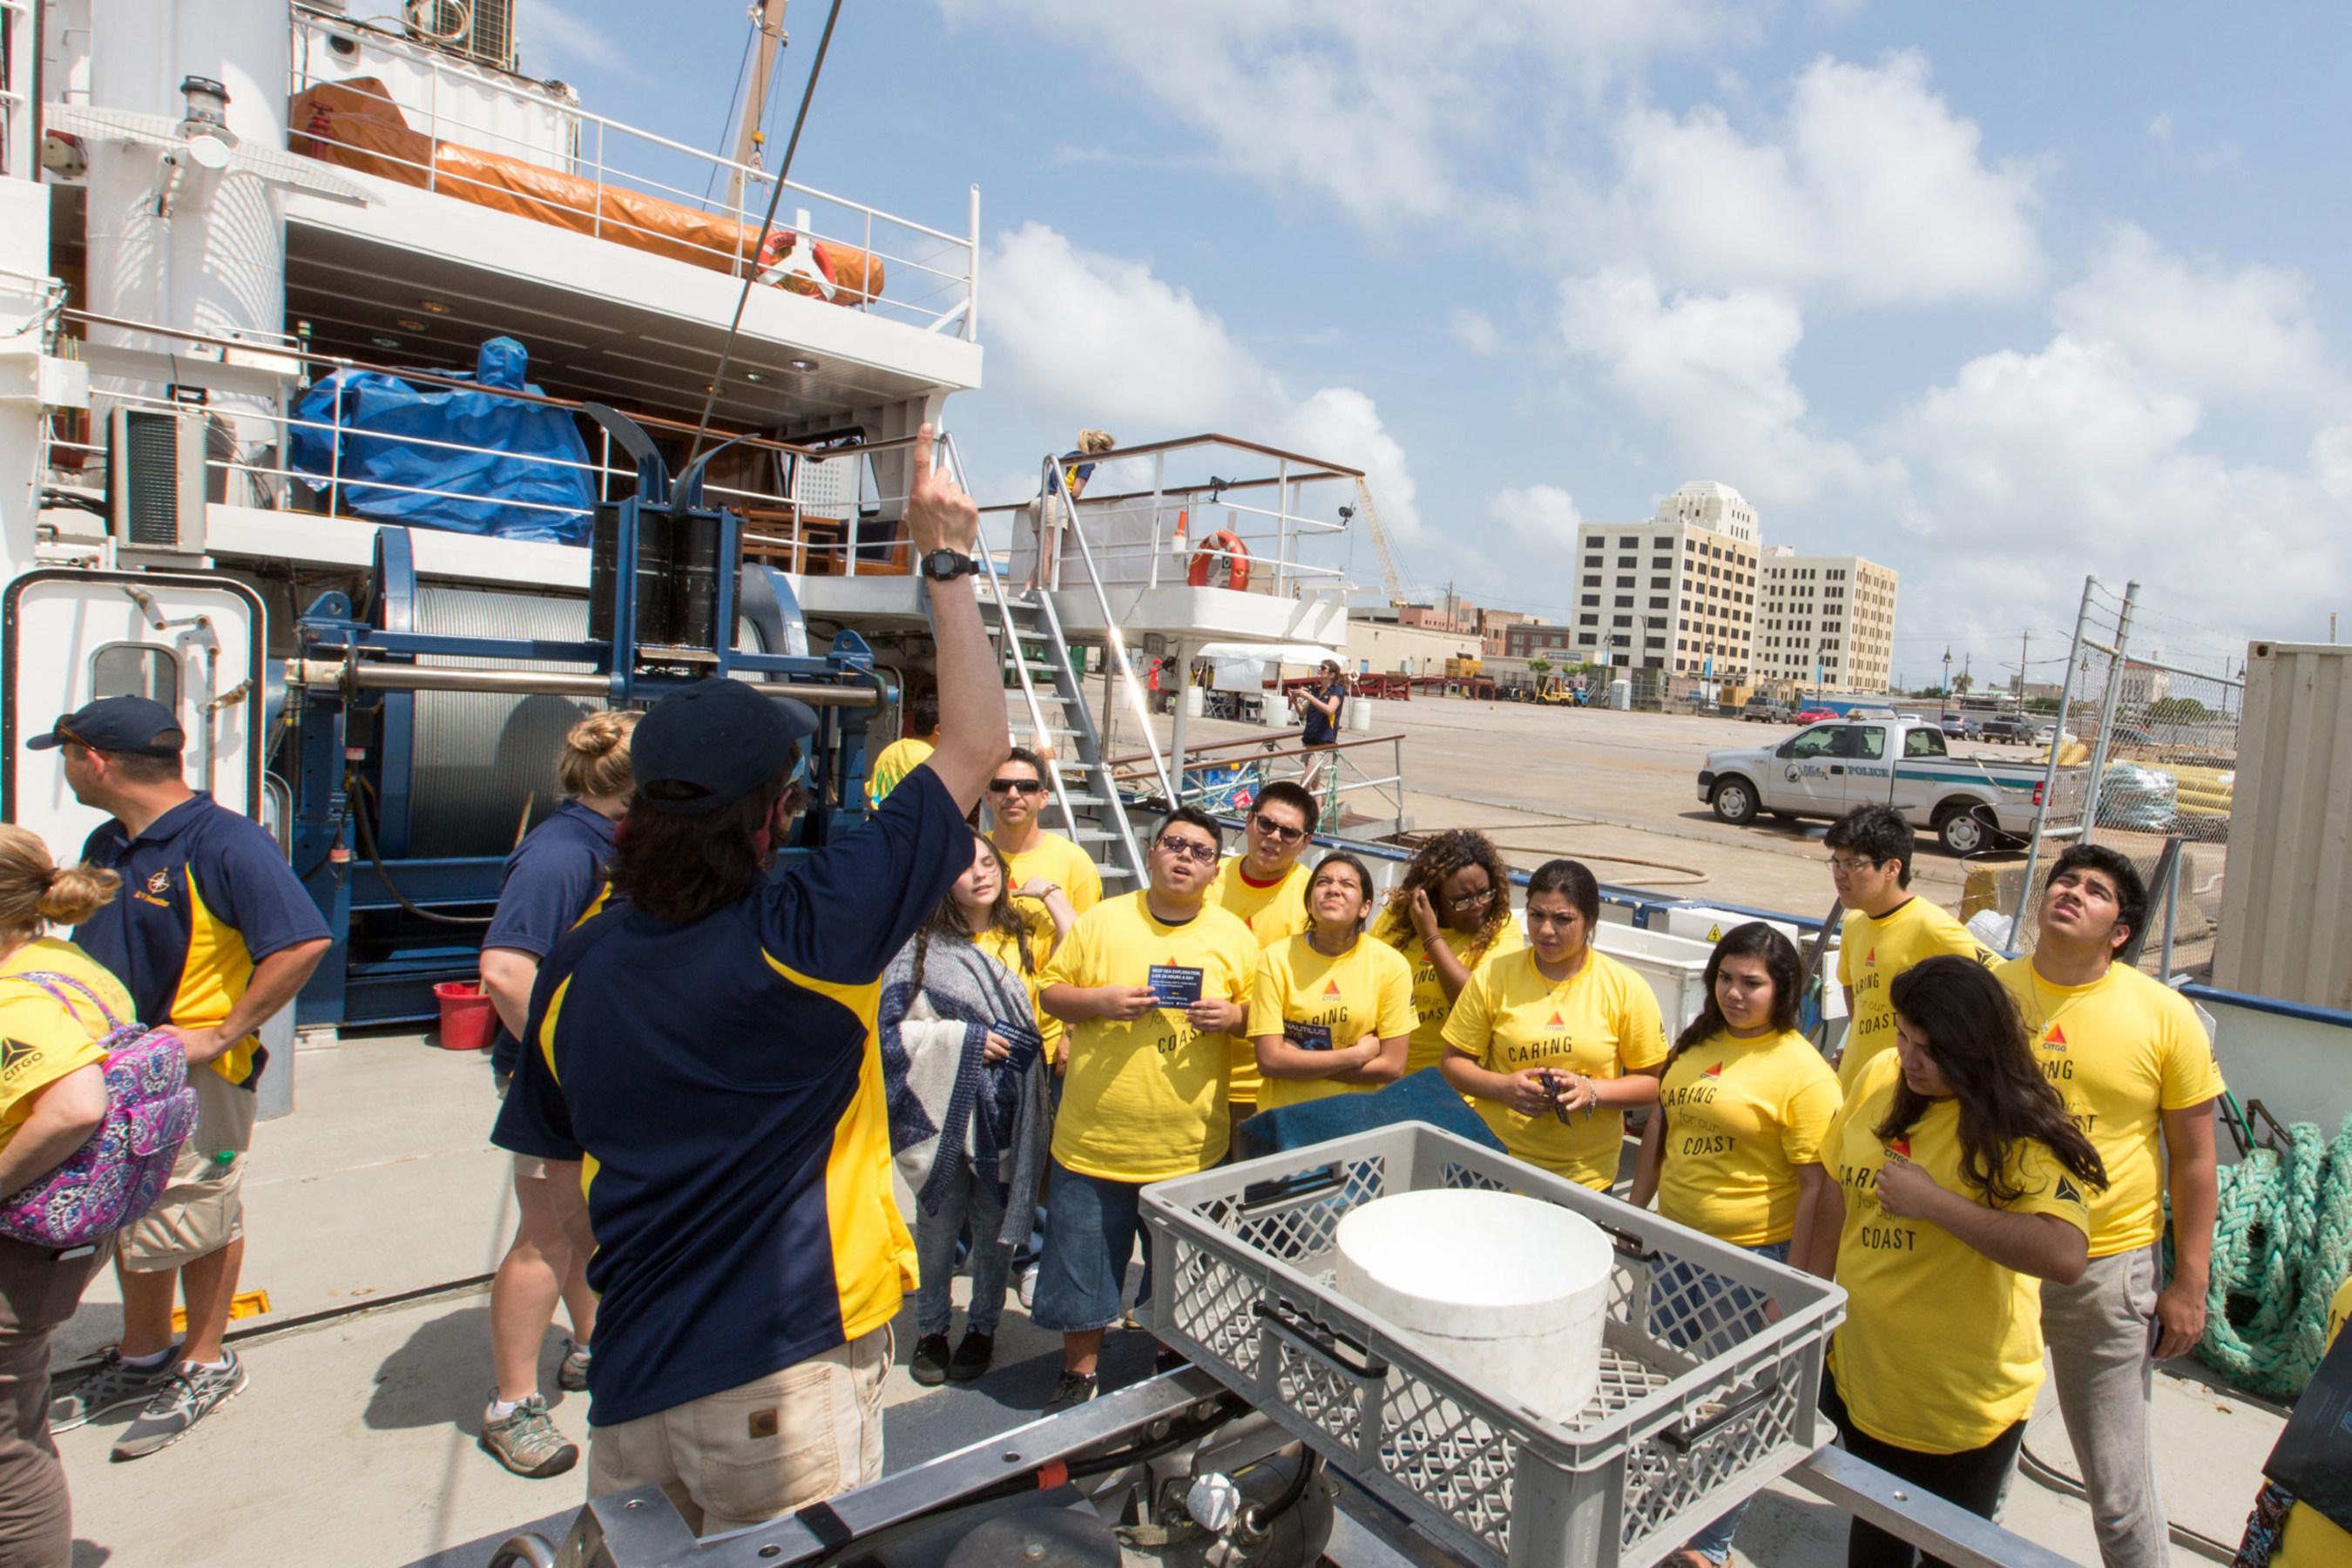 Ocean Exploration Trust conducts ship tours sponsored by CITGO onboard Exploration Vessel Nautilus